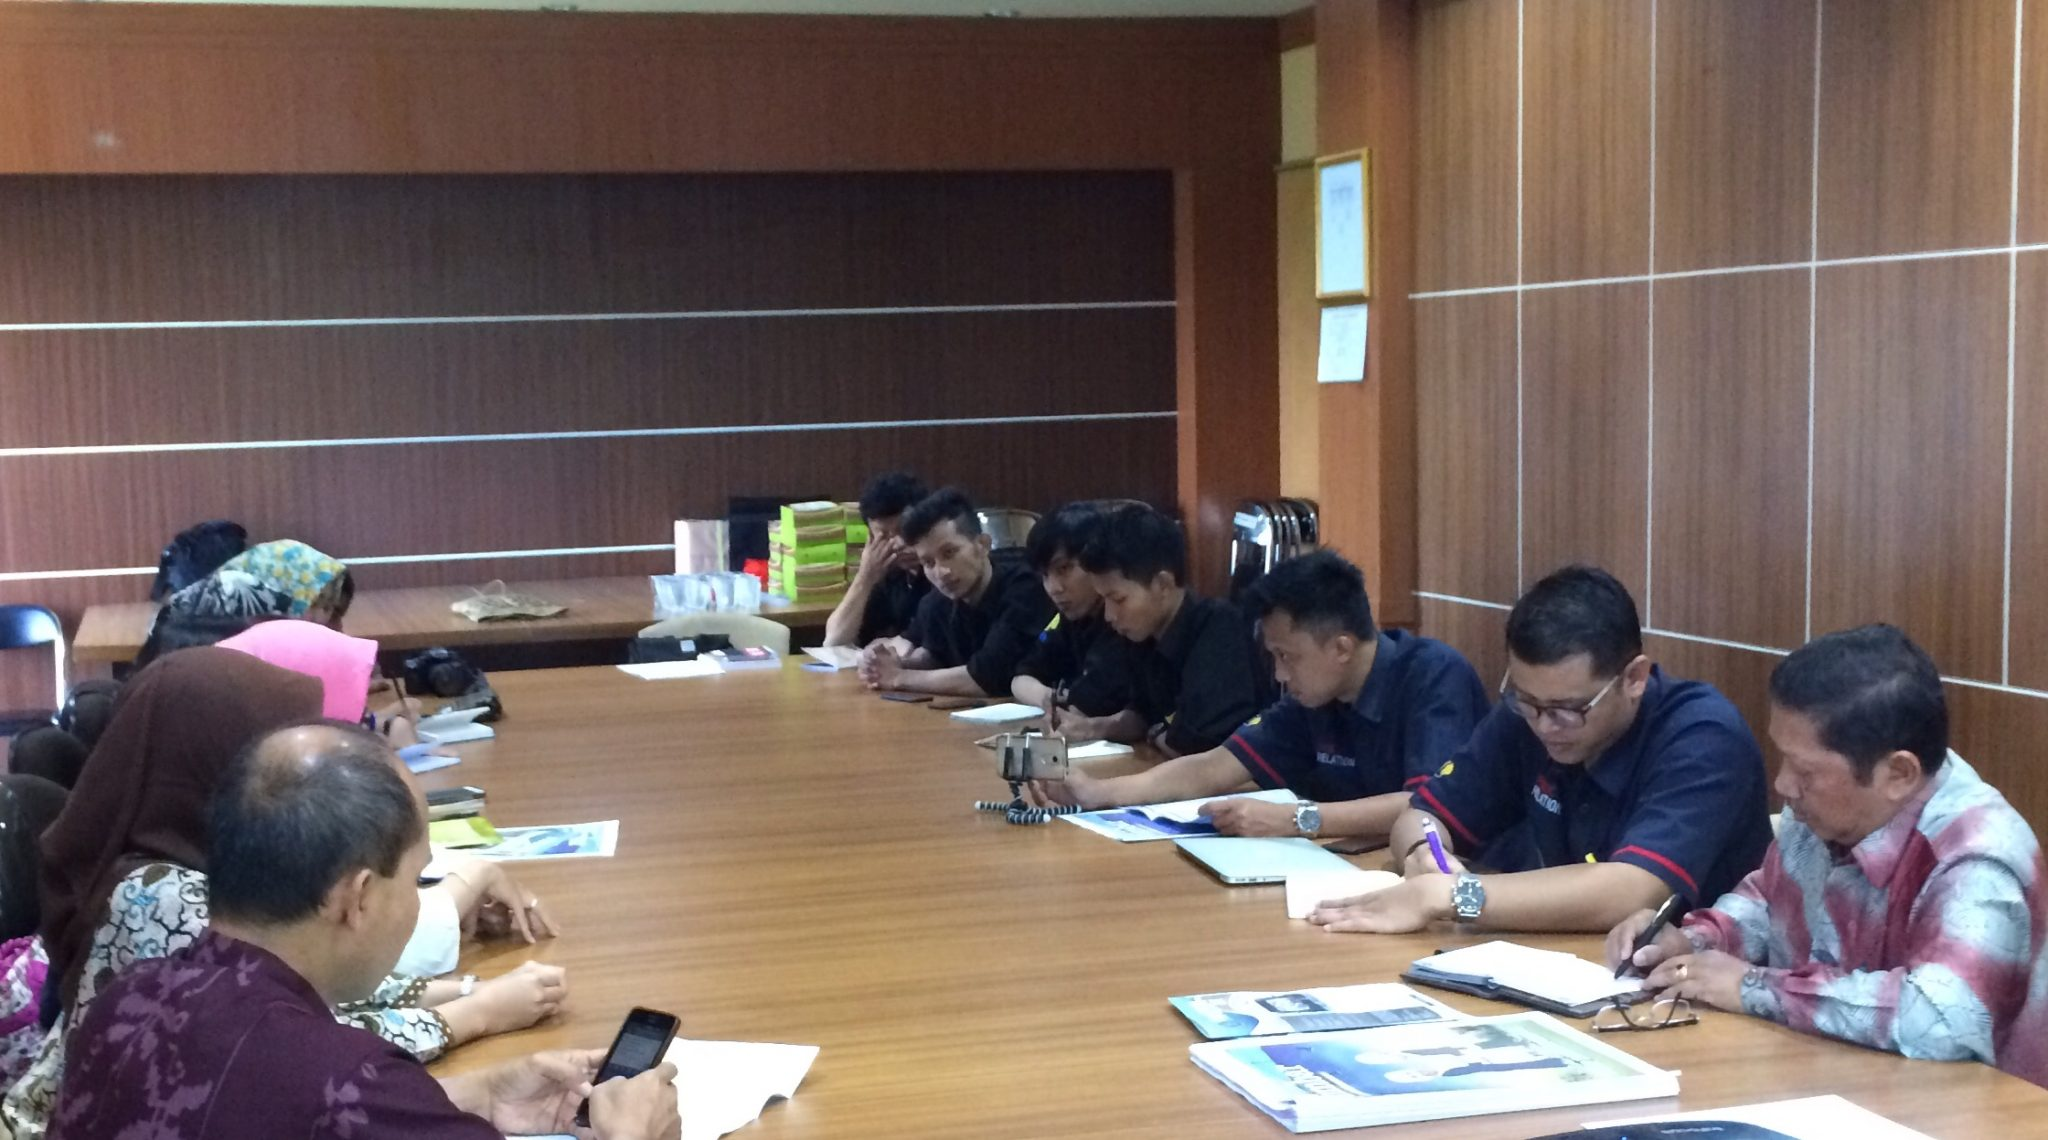 UPT Humas UNNES Adakan Kunjungan Kerja Ke Universitas Brawijaya